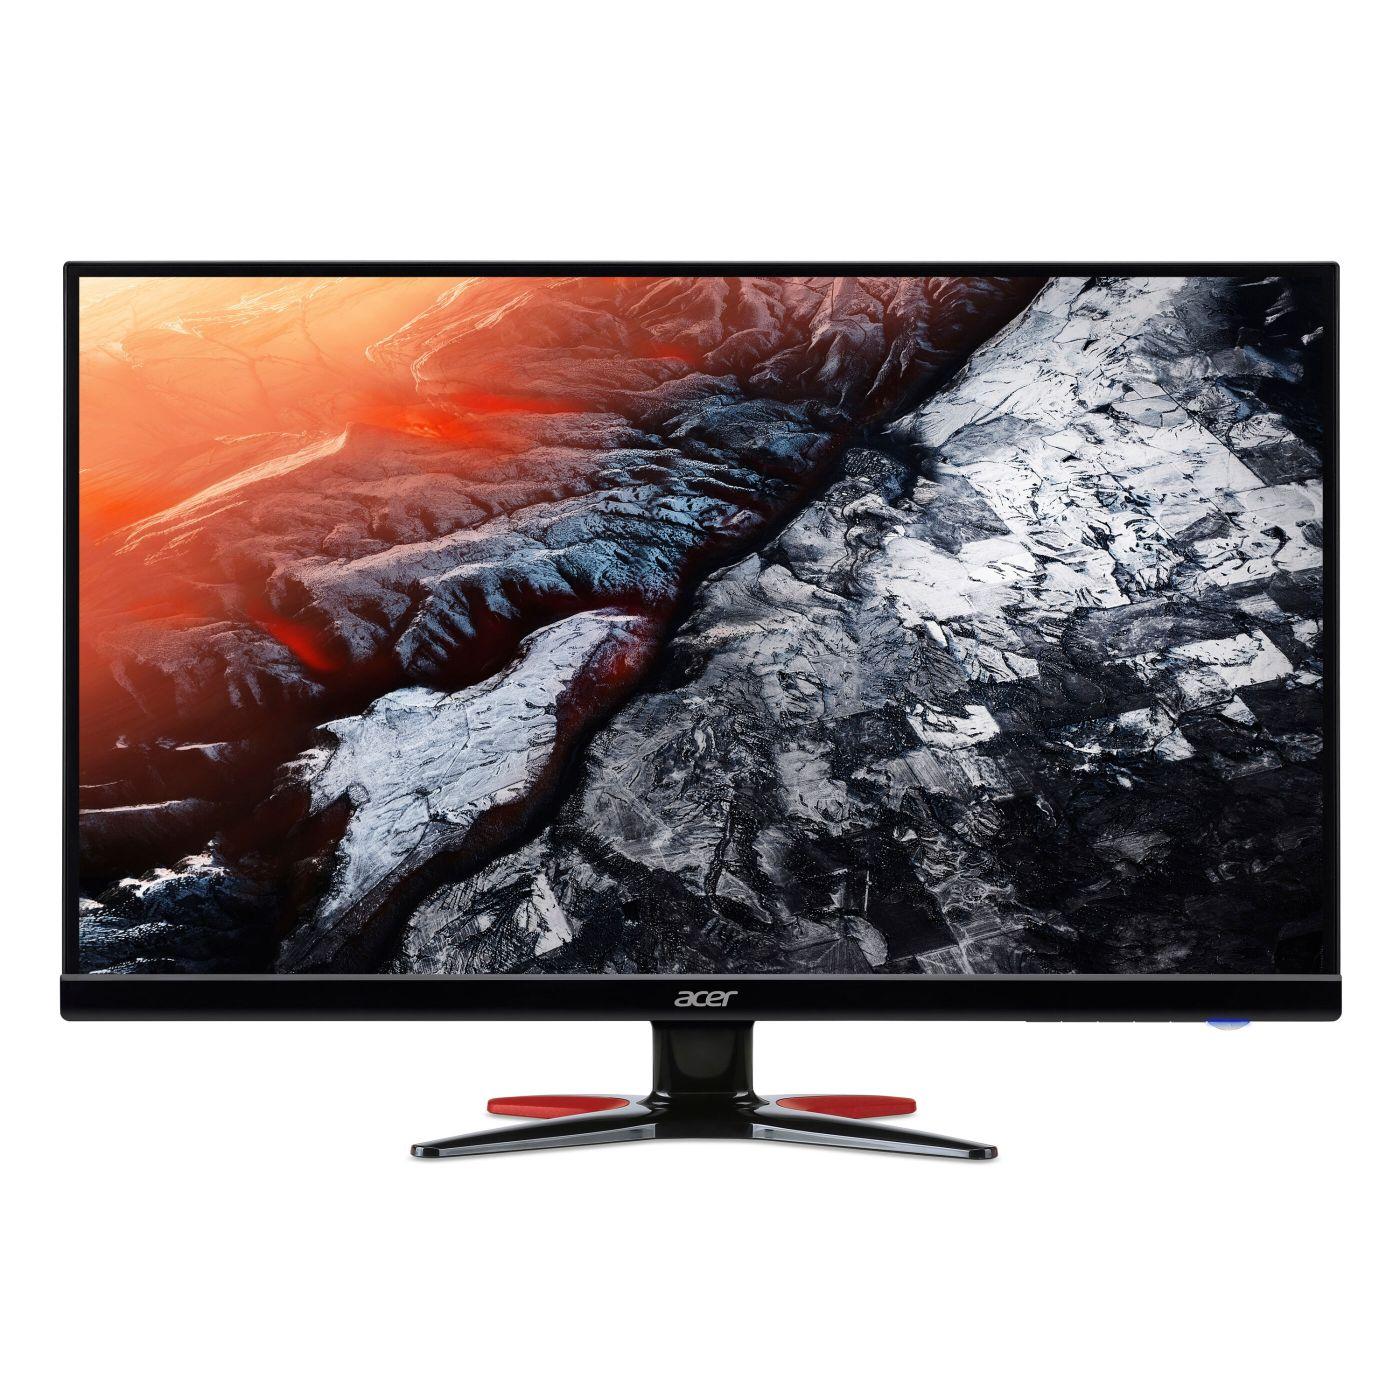 [AMAZON] Acer G6 (G276HLLbmidx) 69 cm (27 Zoll) TN ZeroFrame Monitor Matt (HDMI, DP, VGA, FHD 1920x1080, 1ms (GTG), 60Hz, 300 Nits)